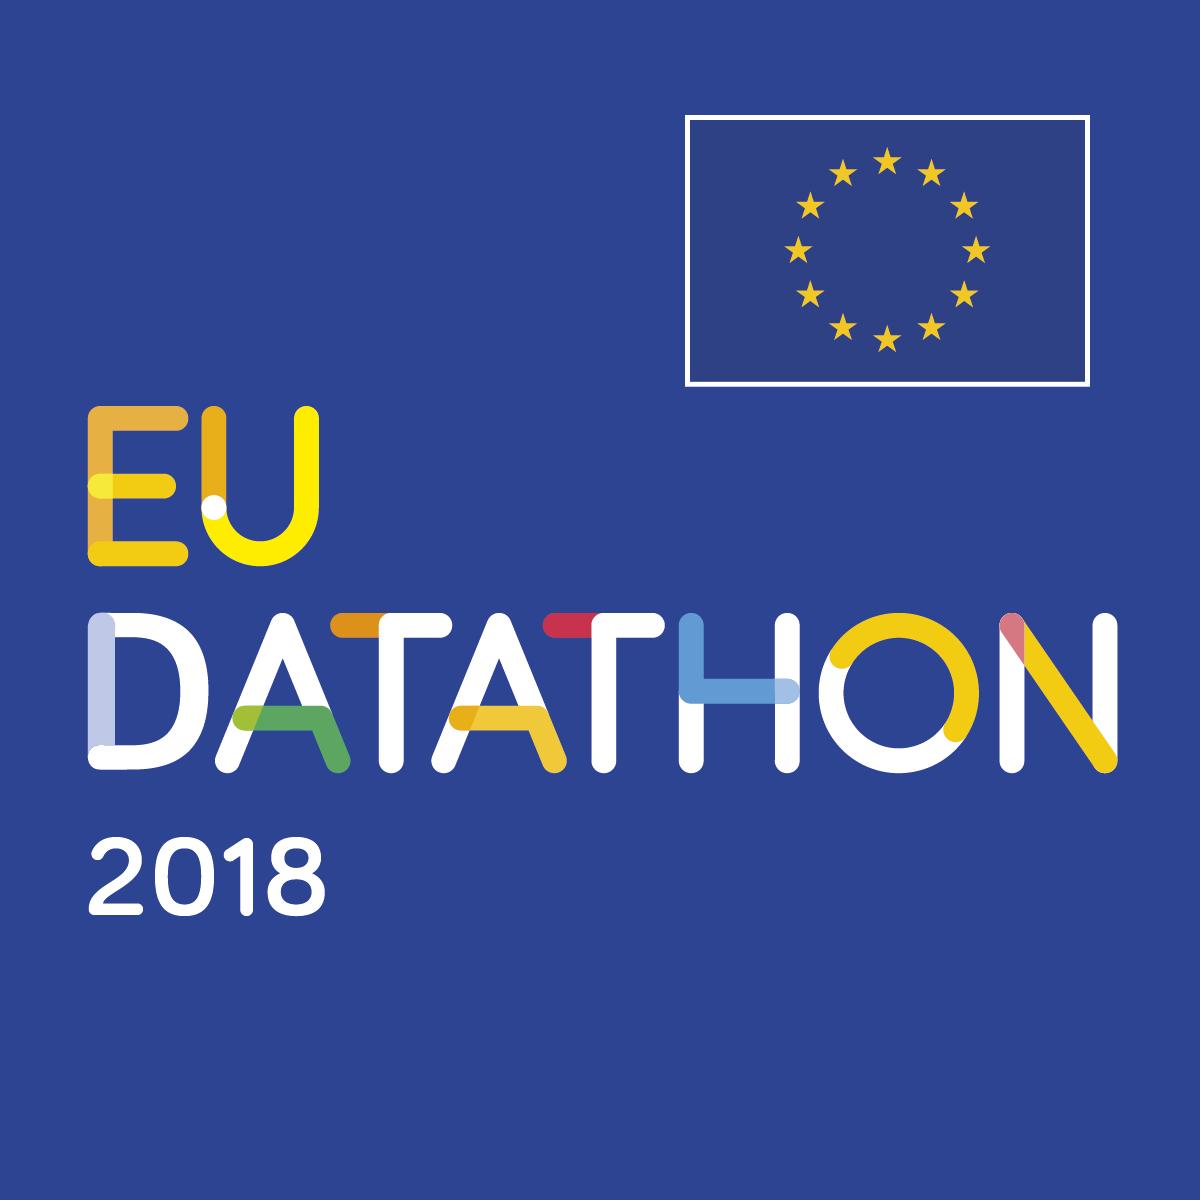 EU Datathon 2018 squared image